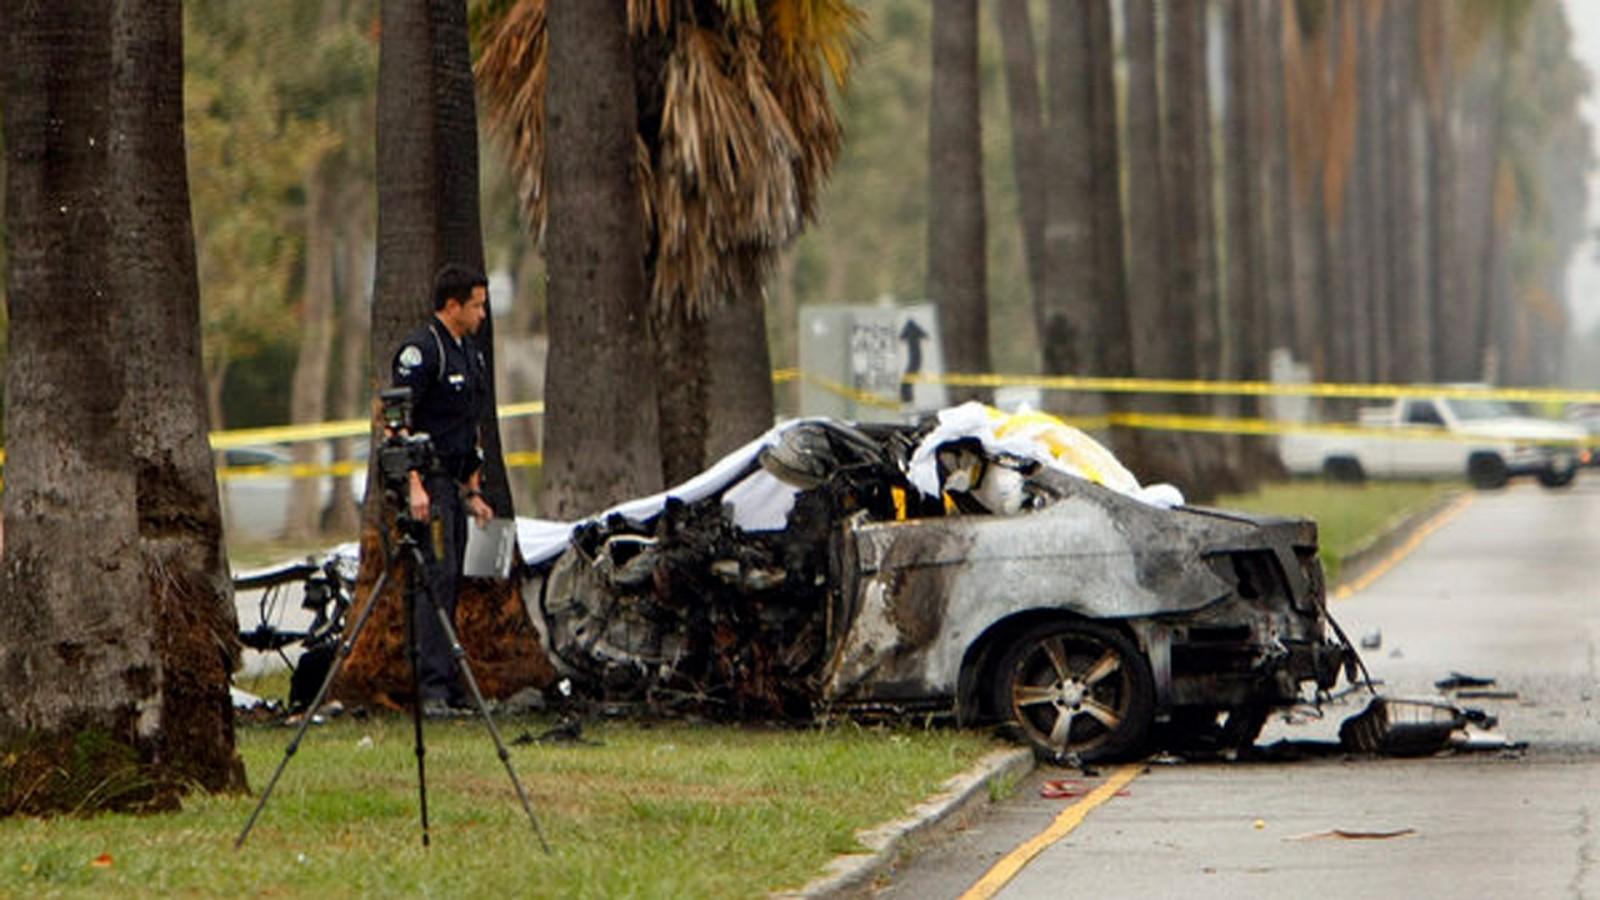 Grace Kelly Death Conspiracy Photos Assassination by Car a...